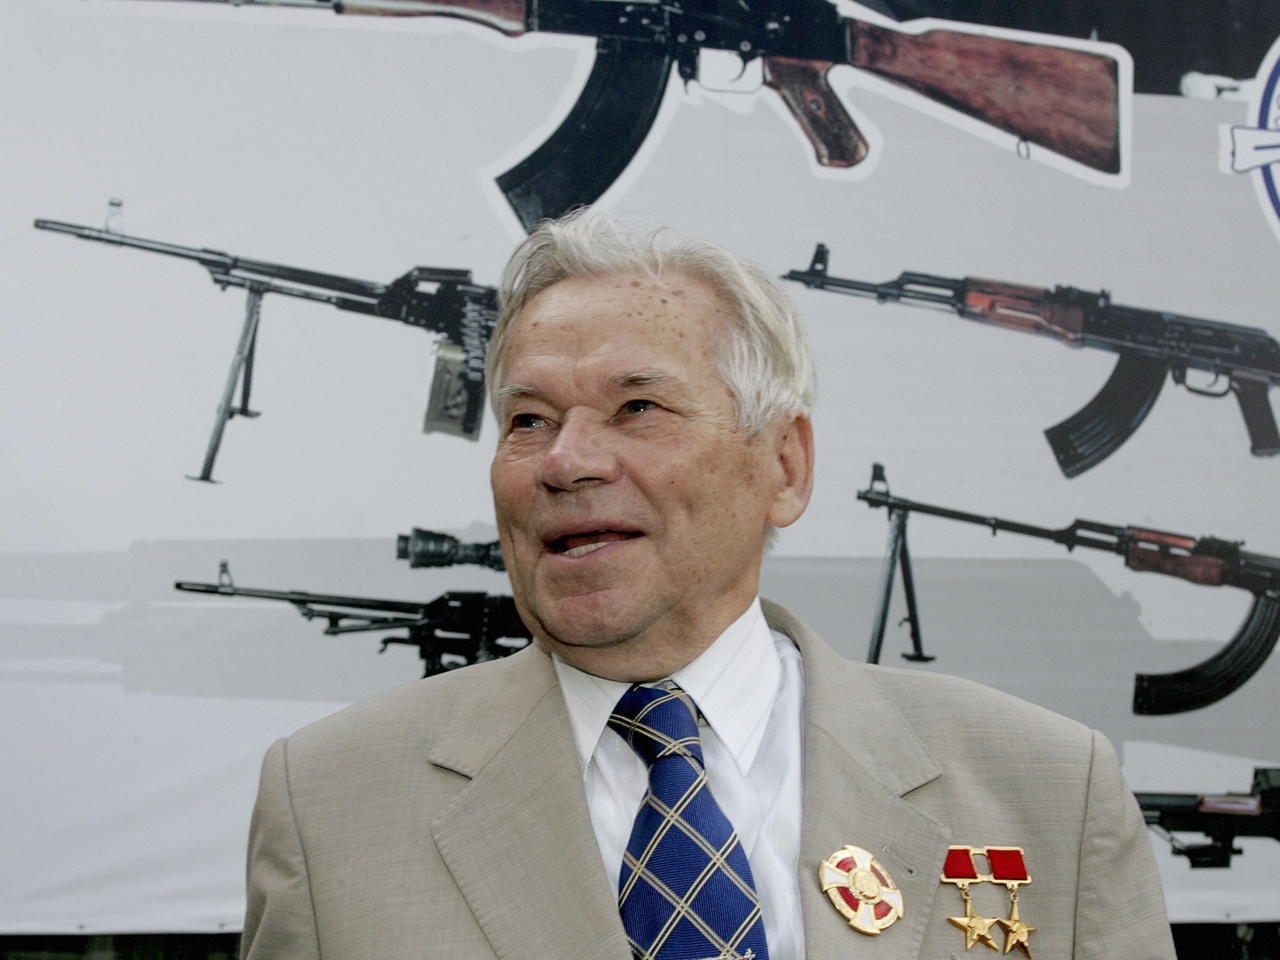 AK-47 designer Kalashnikov wrote penitent letter - CBS News